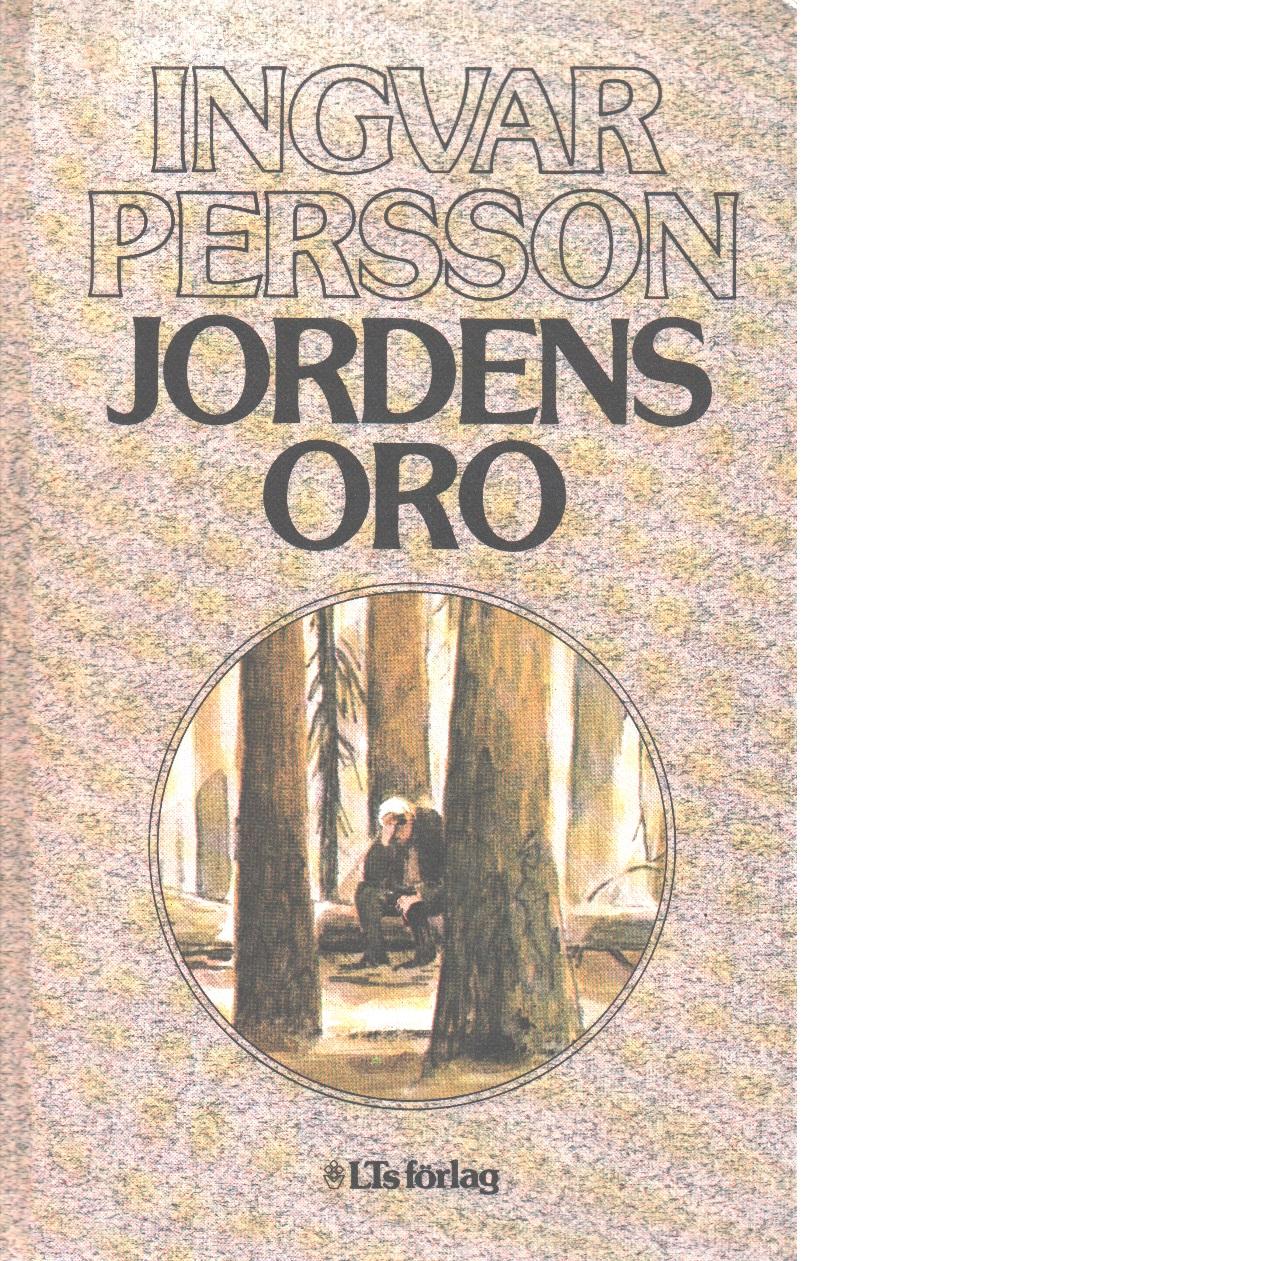 Jordens oro - Persson, Ingvar